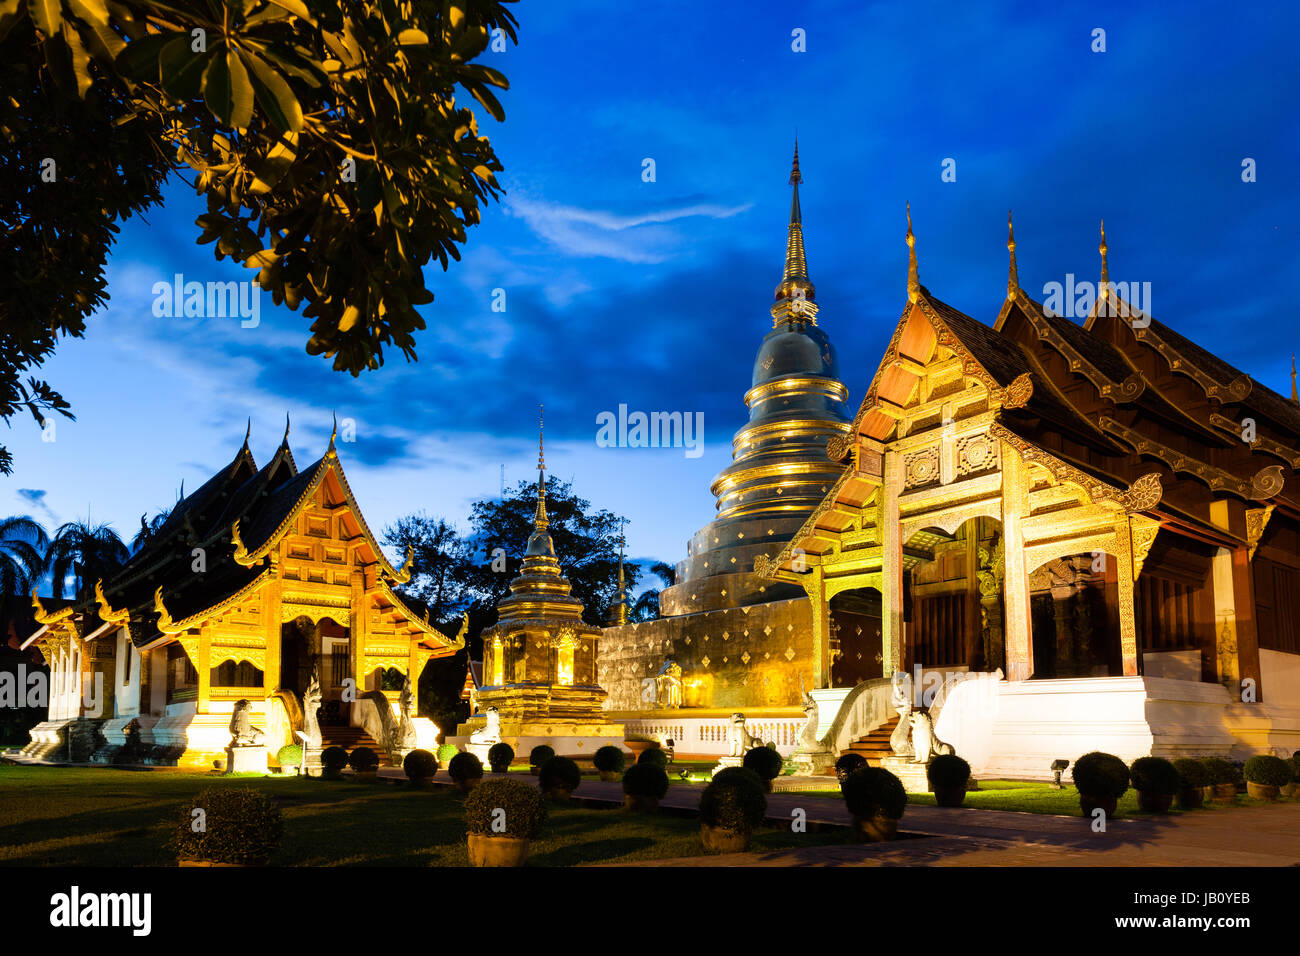 Wat Phra Singh Woramahaviharn. Buddhist temple in Chiang Mai, Thailand. - Stock Image